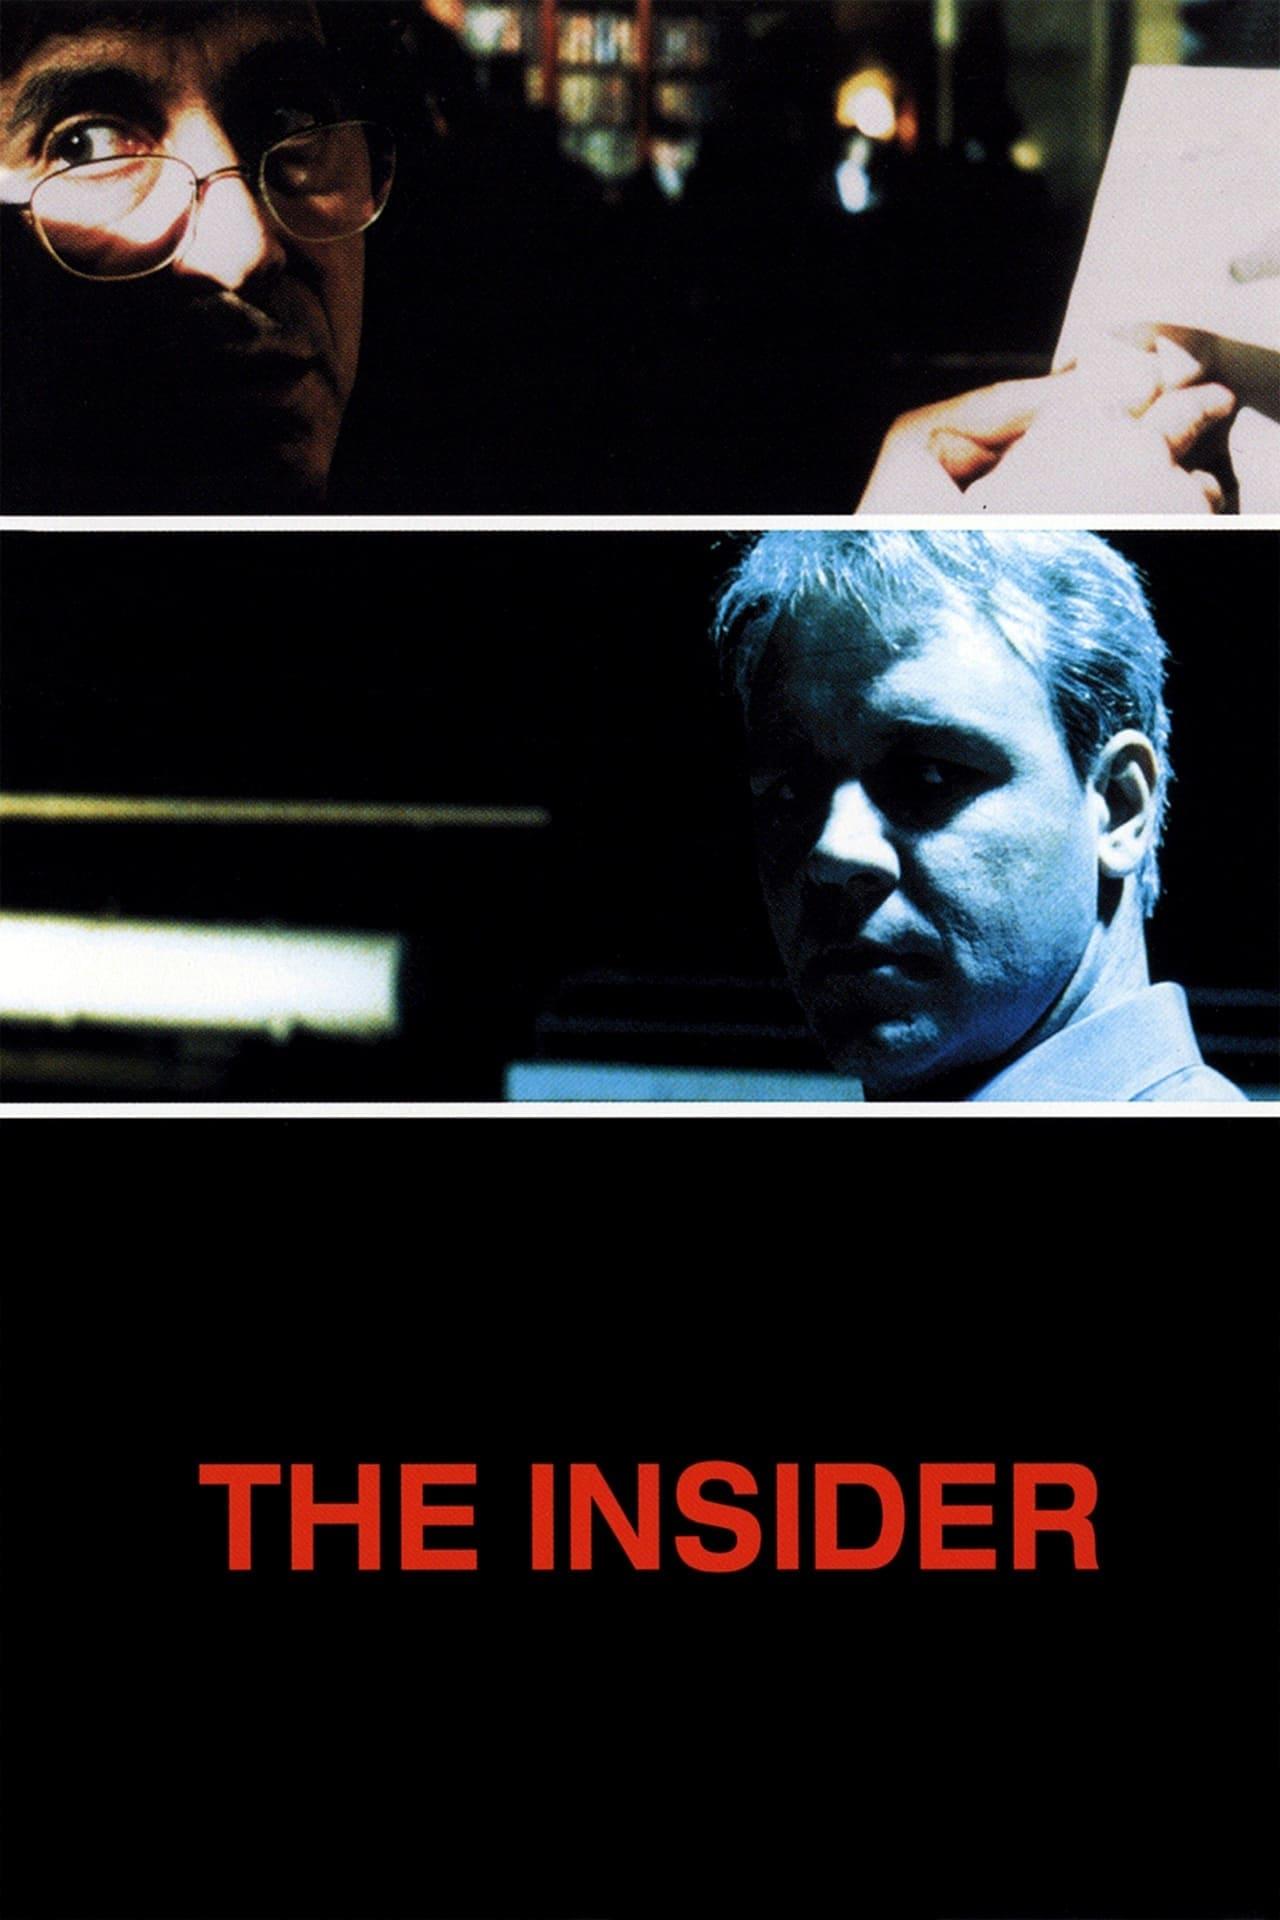 El dilema (The Insider)